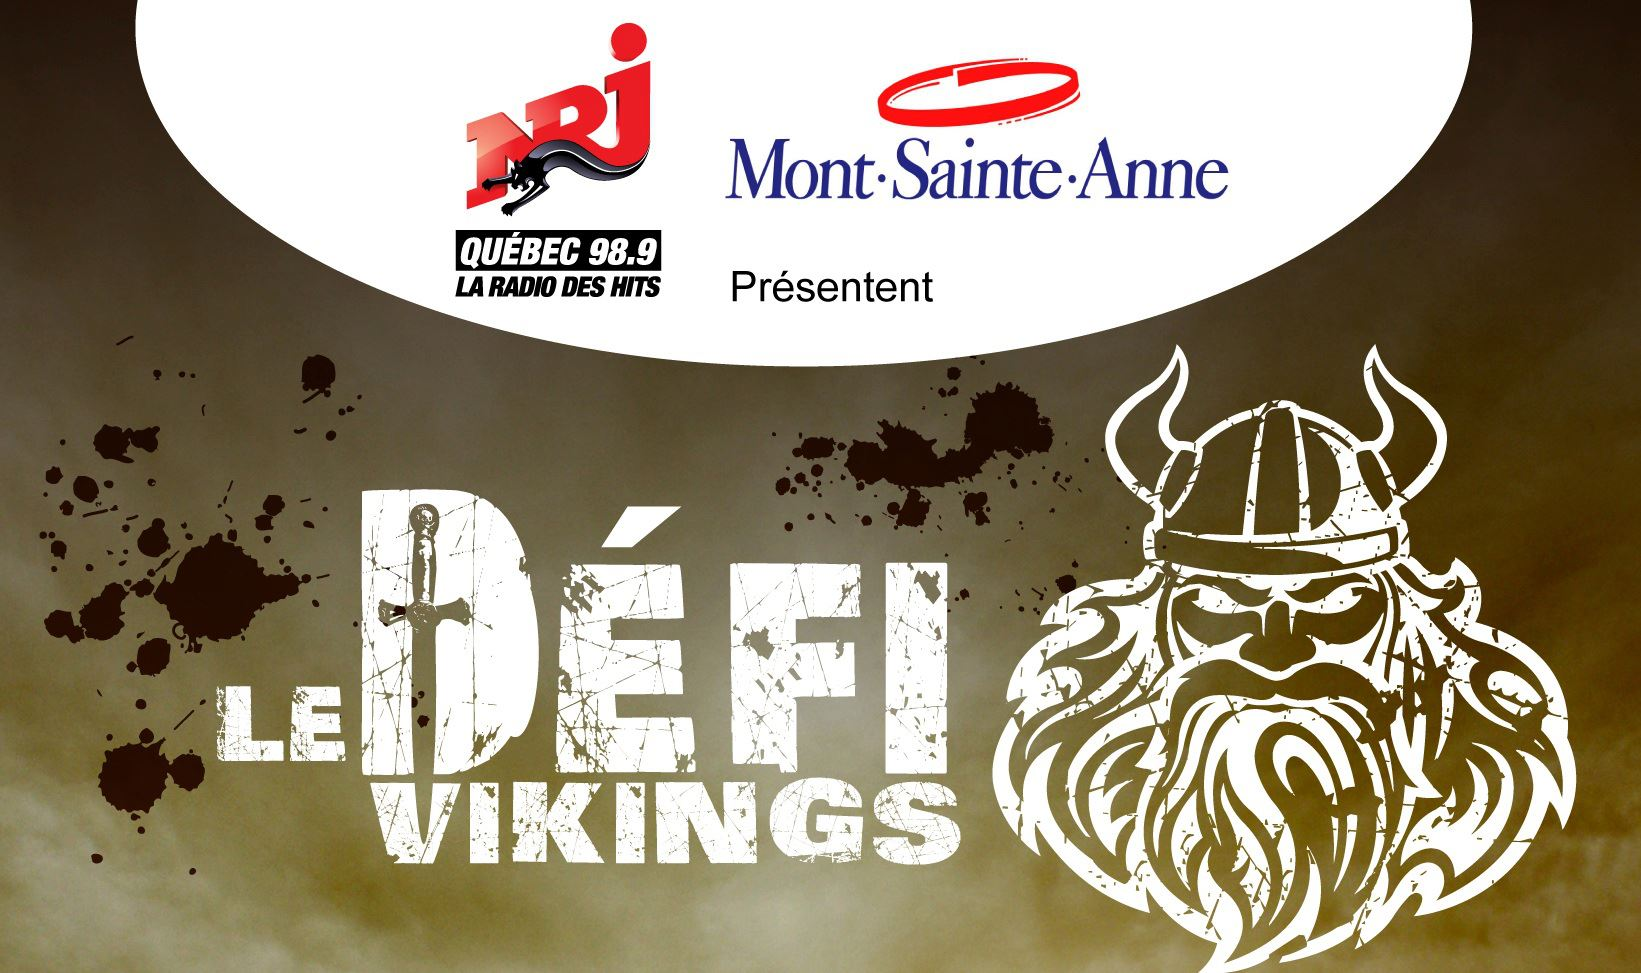 Vikings Calendrier.Courseobstacle Com Defi Vikings